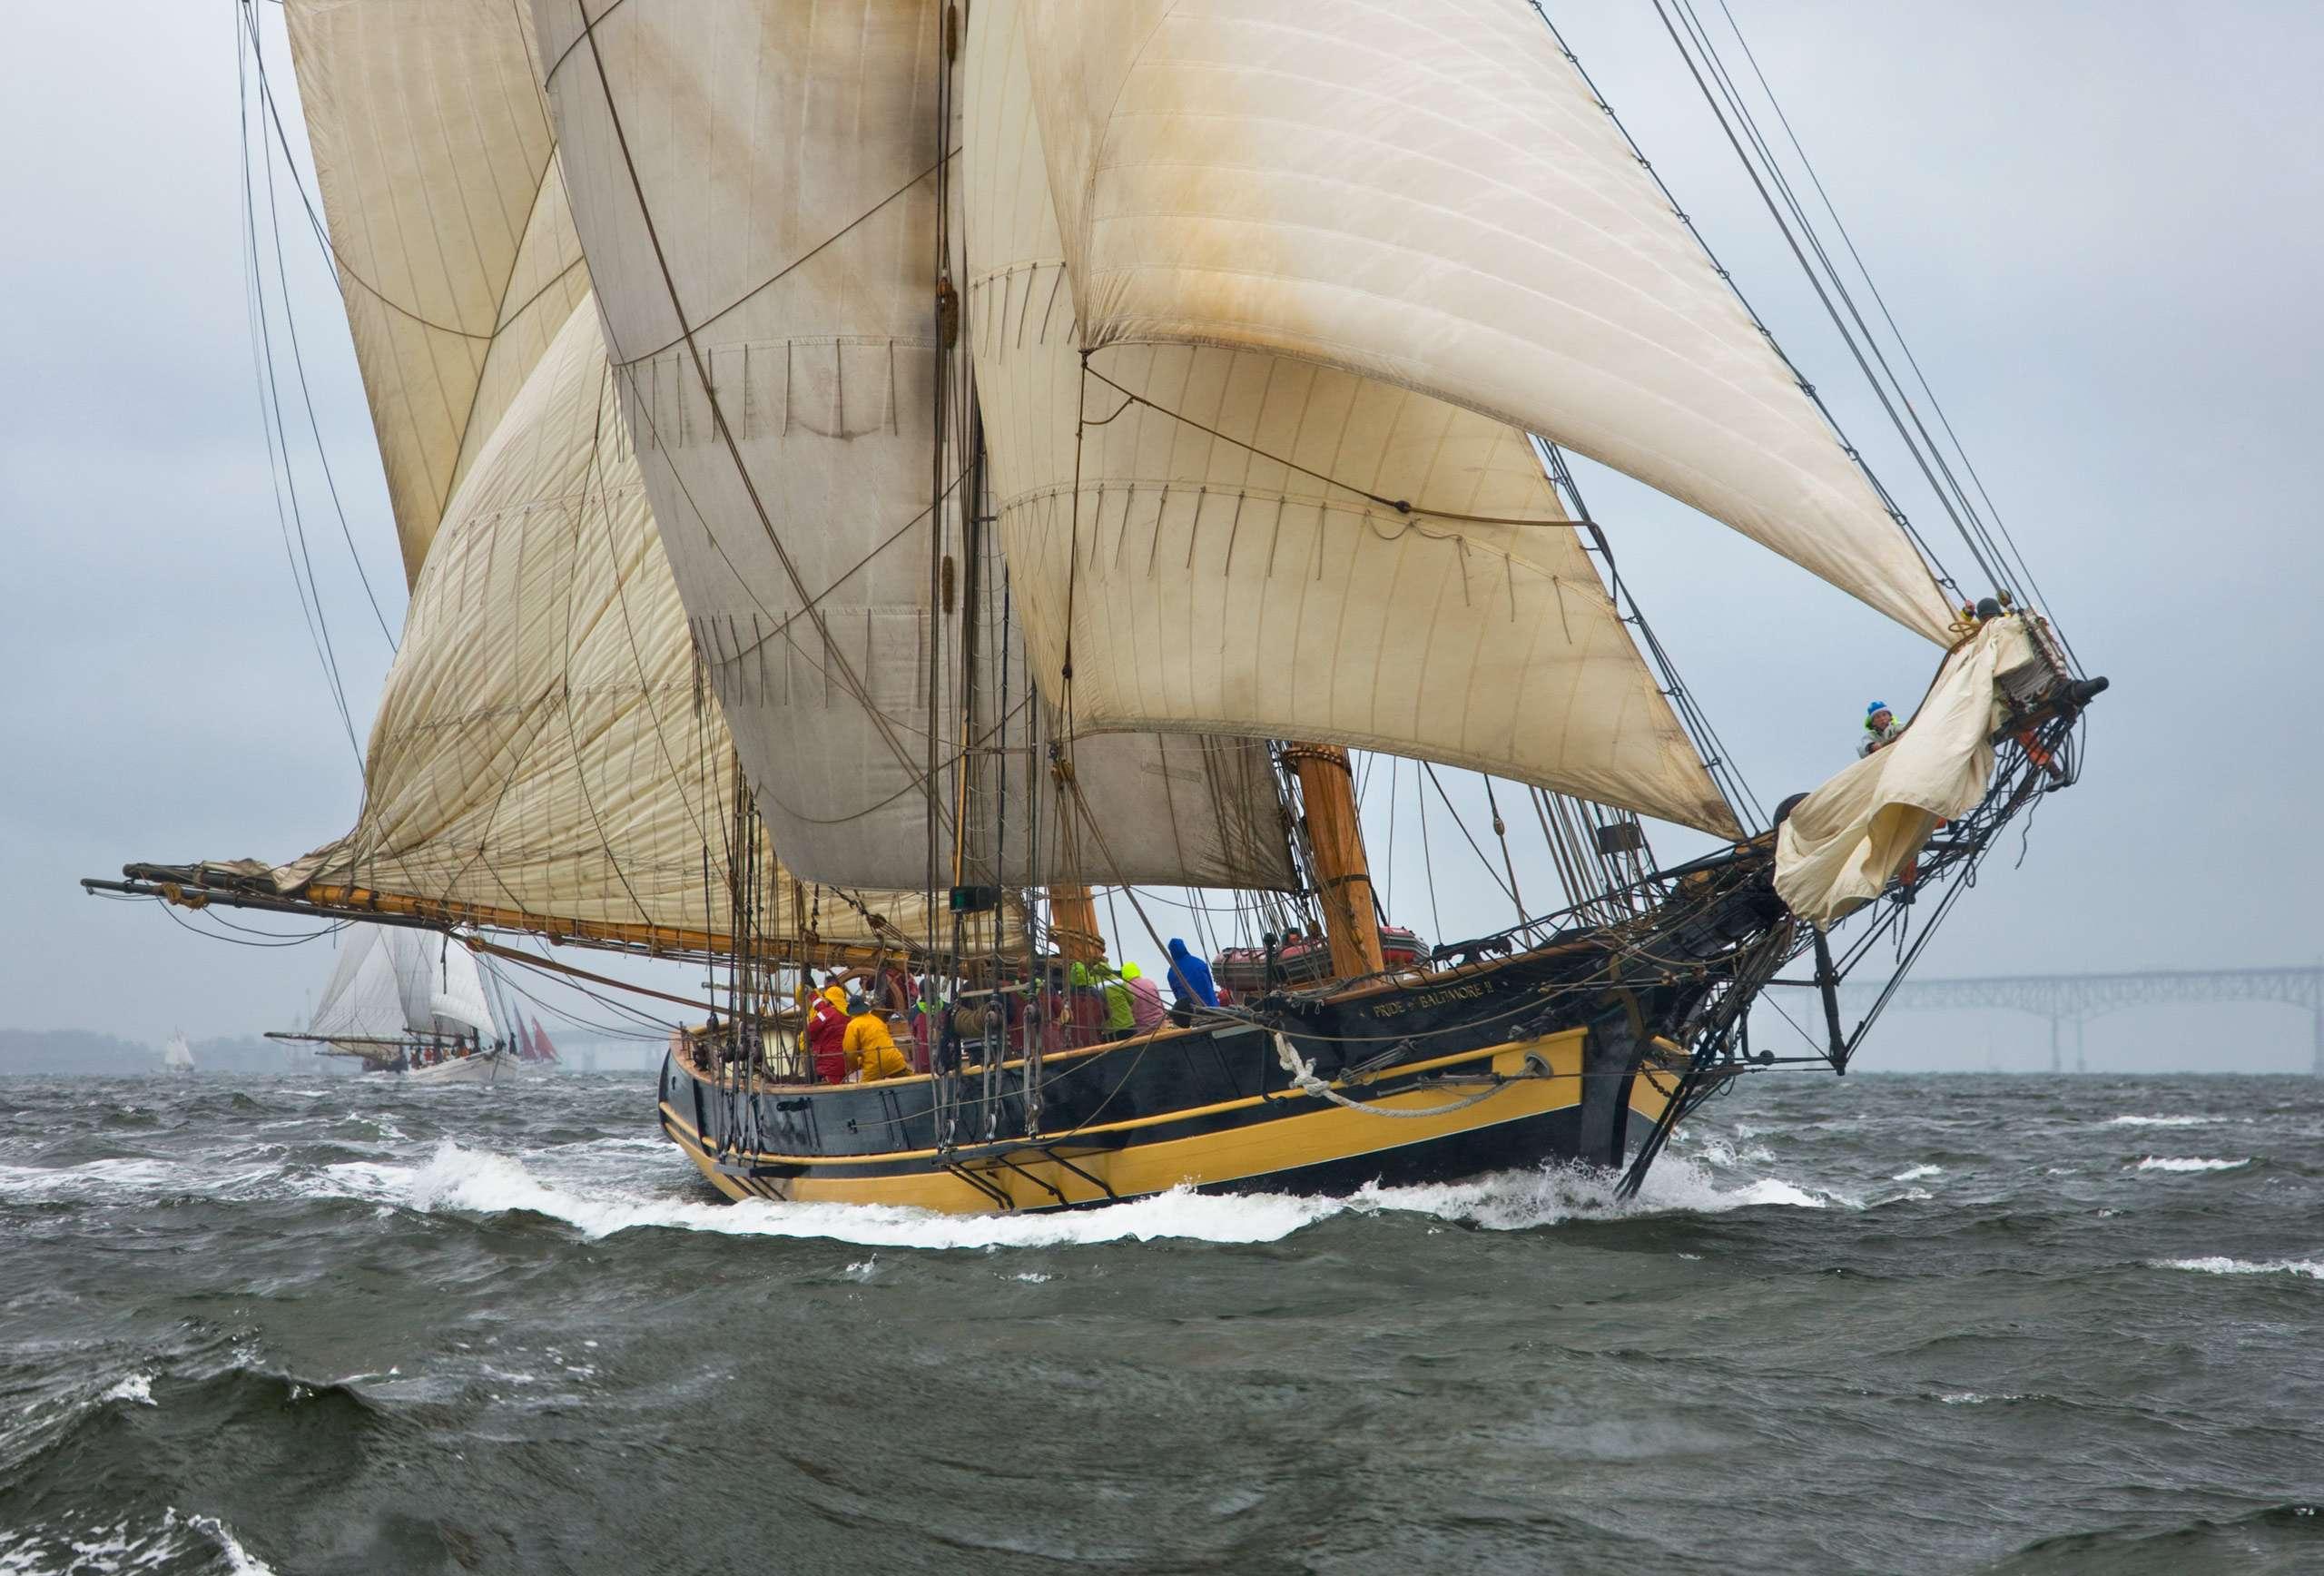 PORTFOLIO - Sailing - Tall Ships #6-PCG508